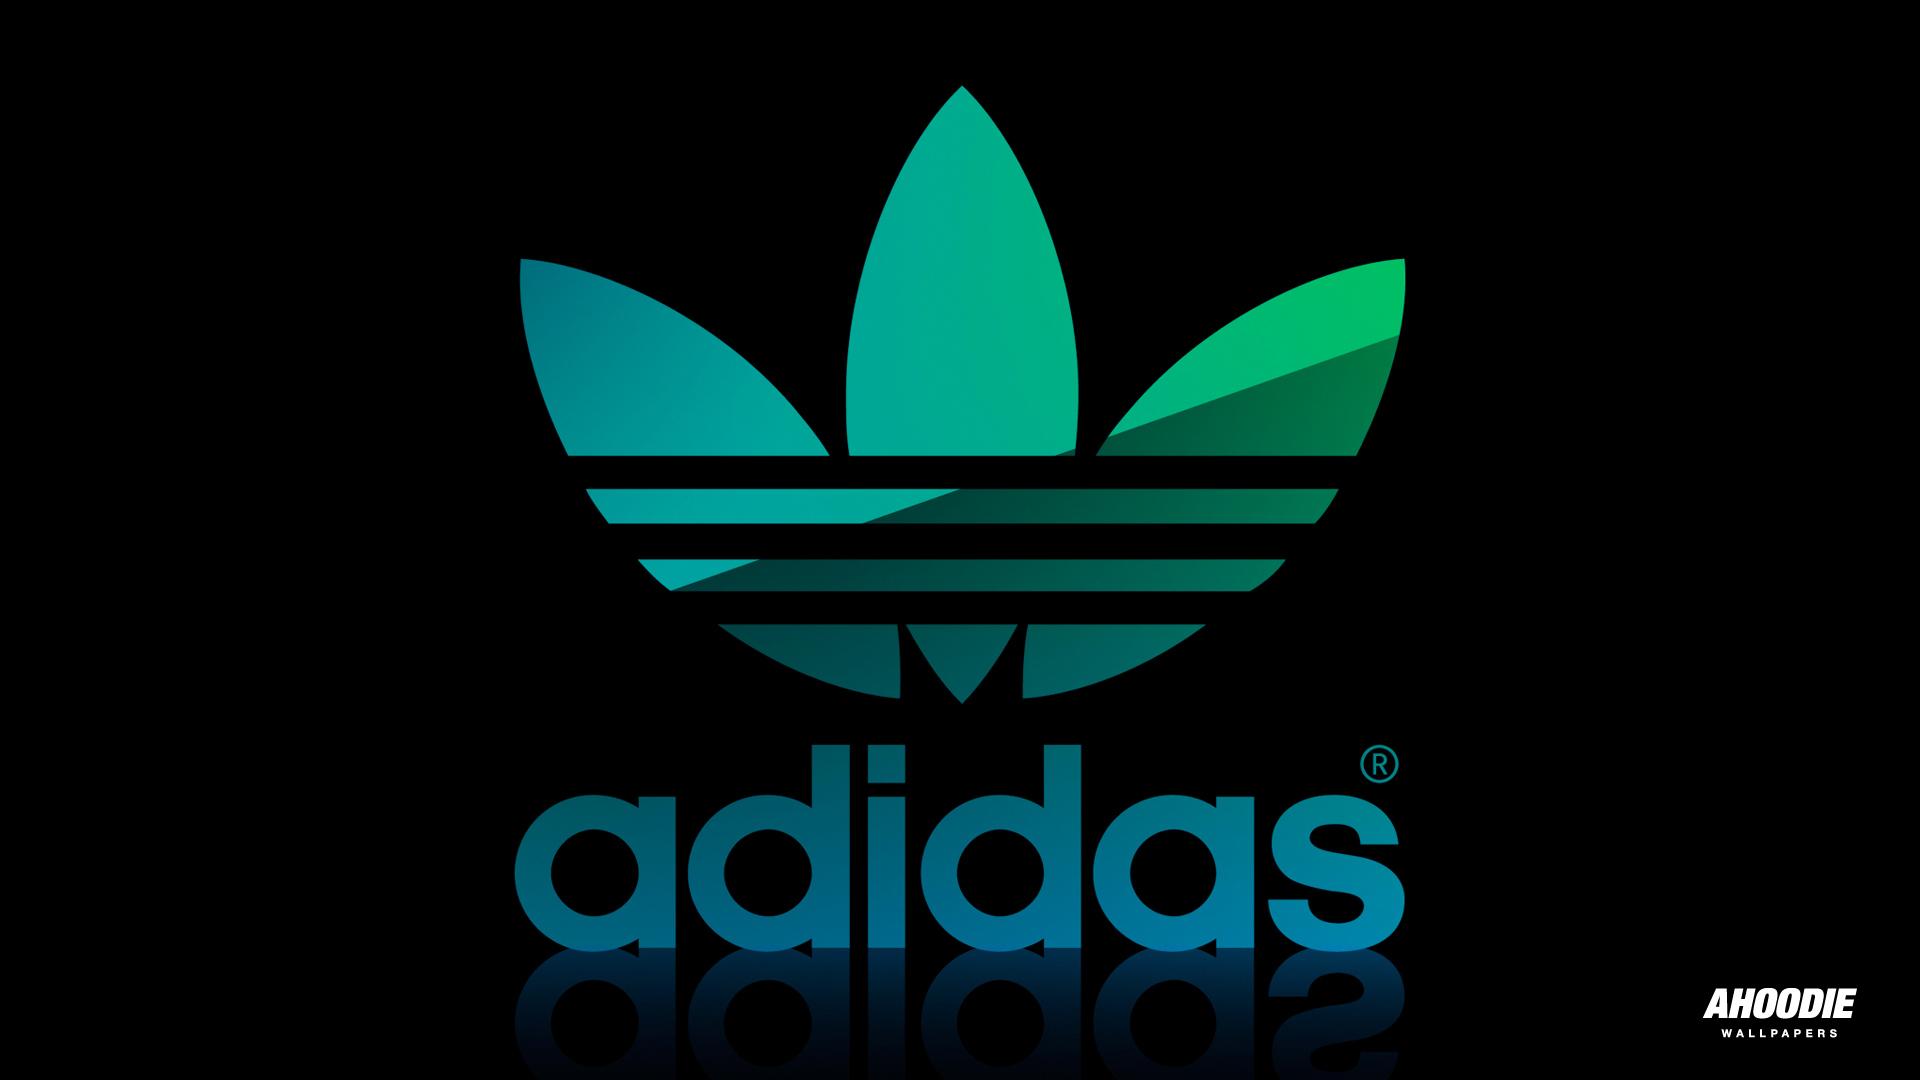 Adidas Images